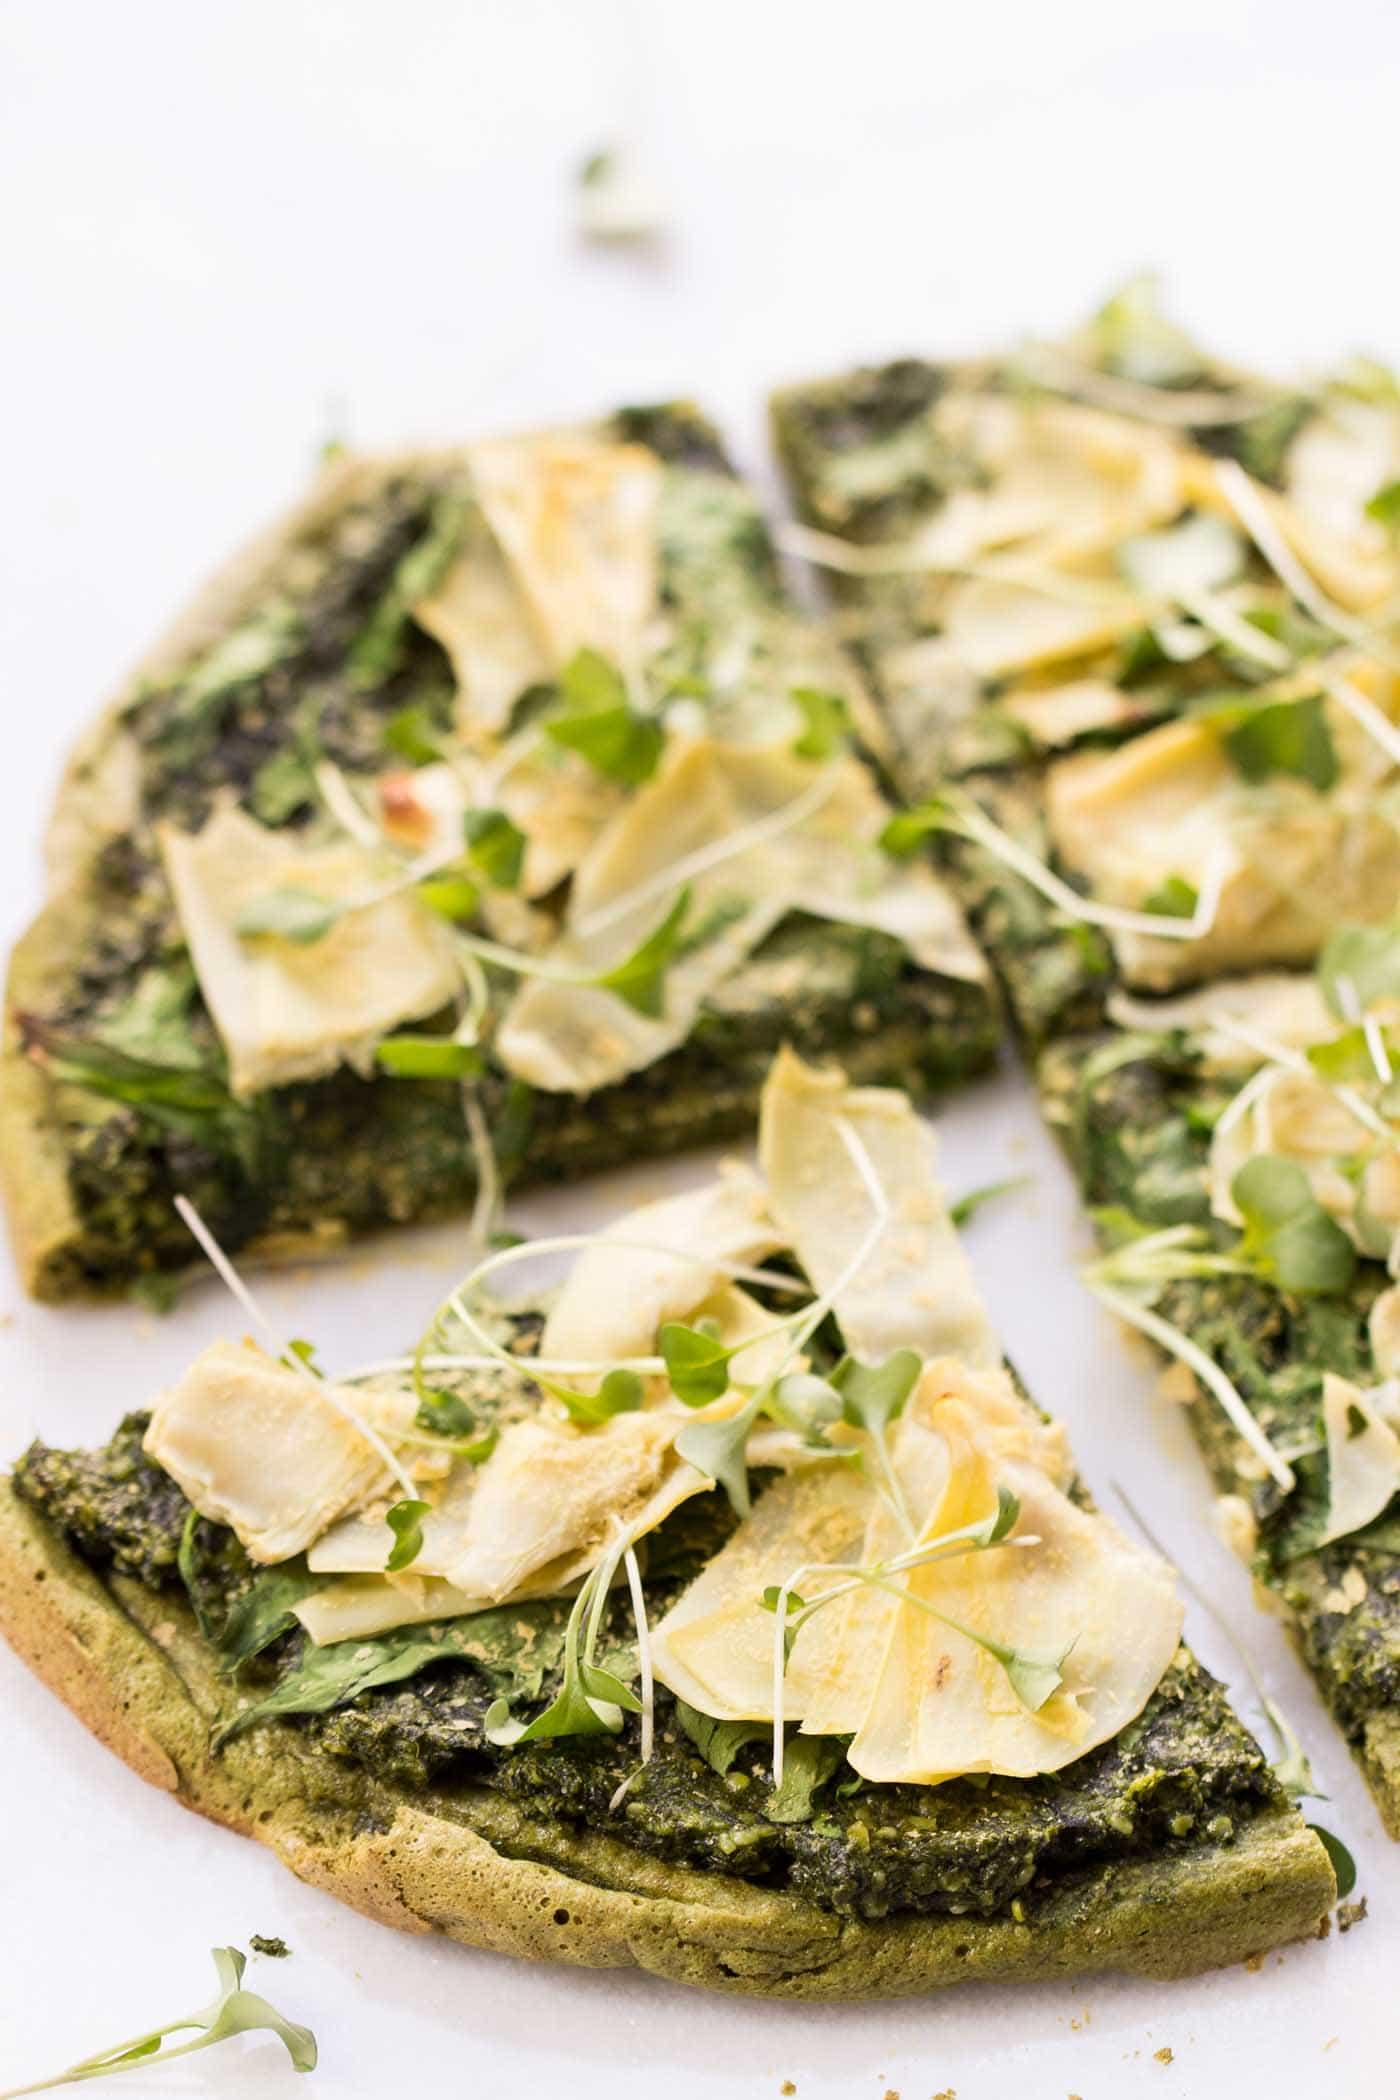 Vegan Quinoa Pizza Crust with Pesto | The Green Loot #vegan #healthy #weightloss